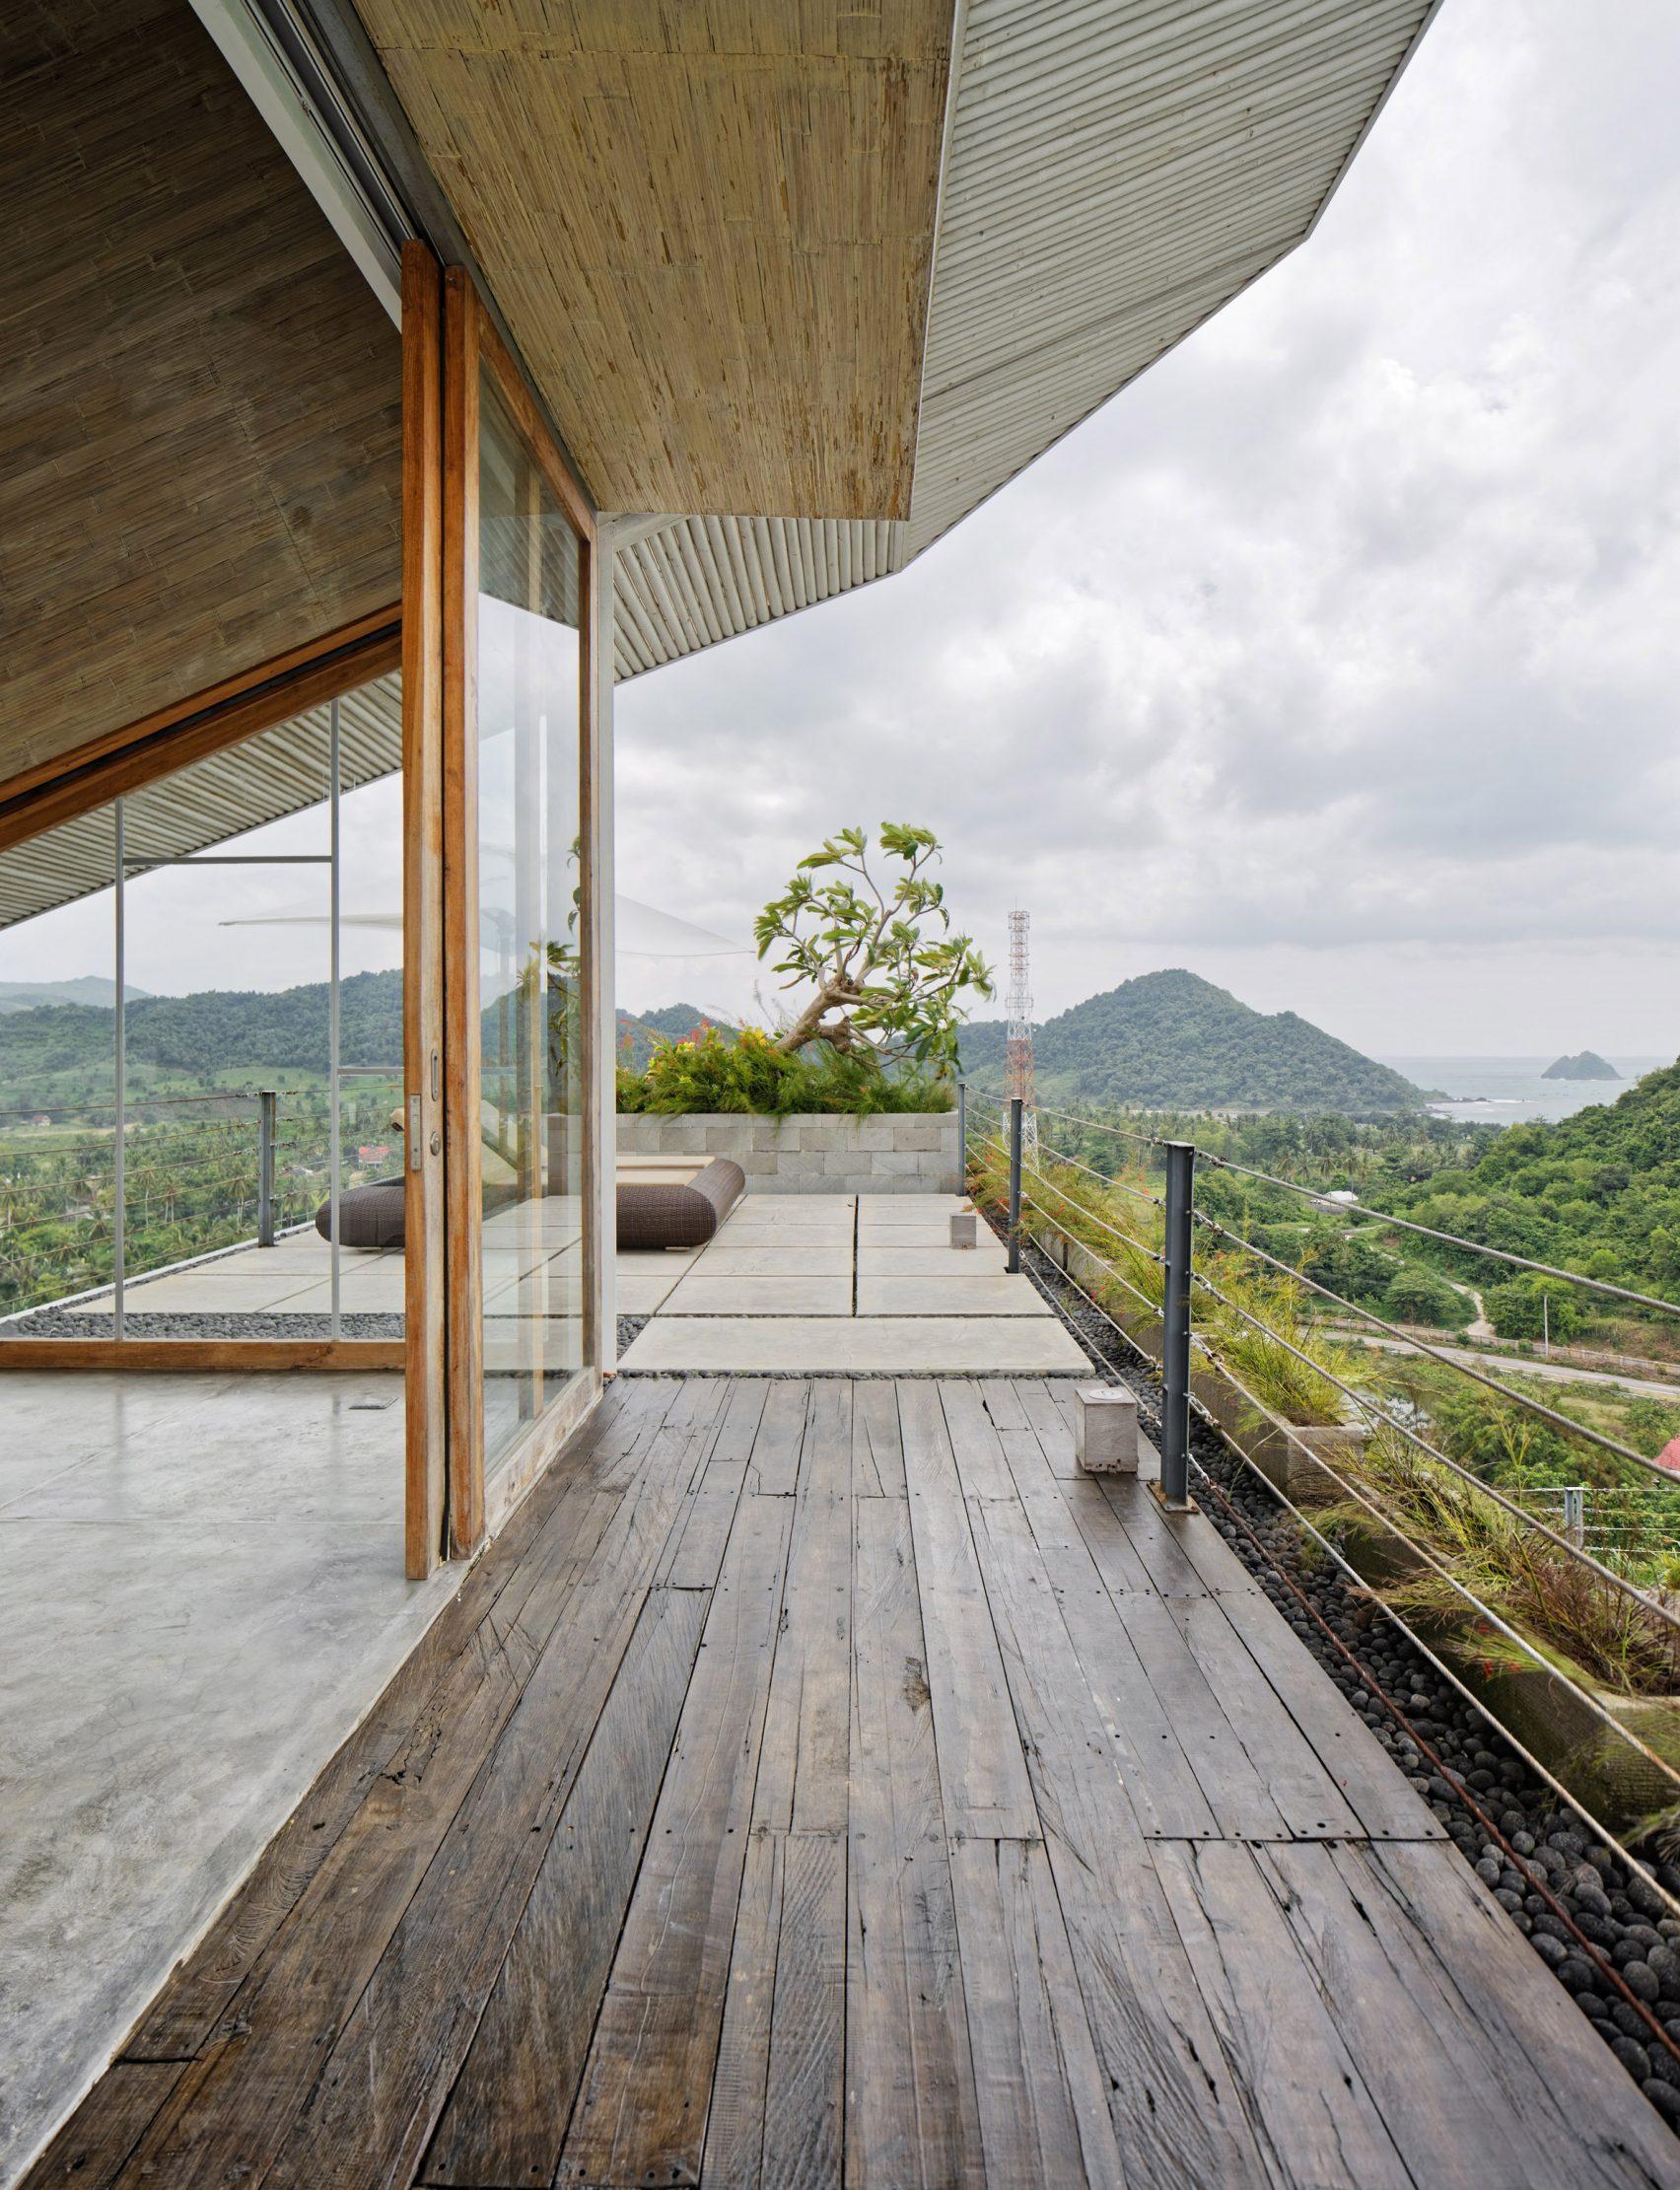 clay-house-budi-pradono-architects-architecture_dezeen_2364_col_20-1704x2221.jpg